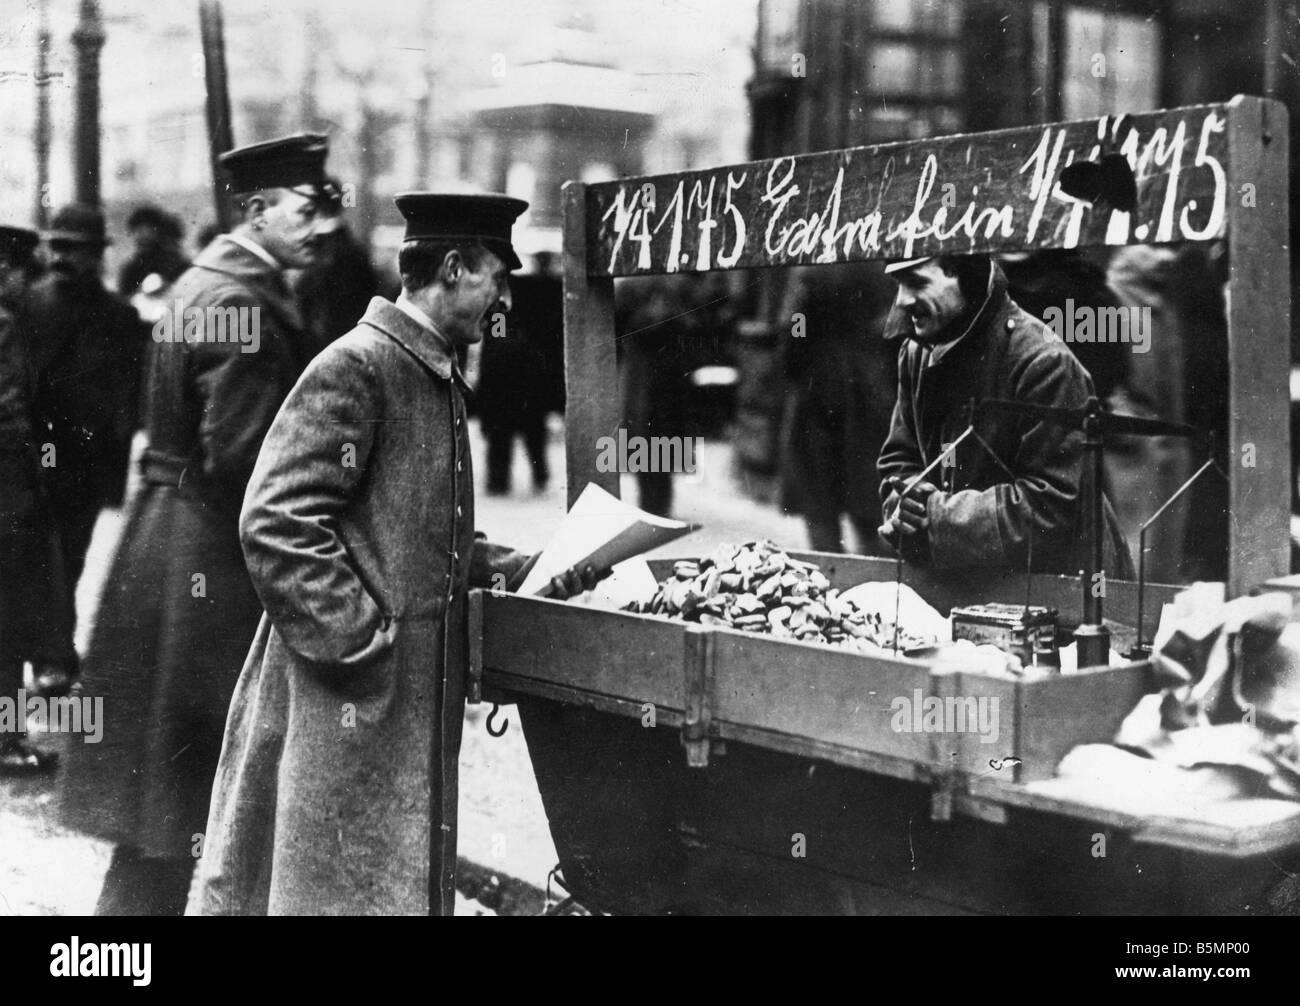 8 1918 12 0 A4 Soldier Sells Christmas Cookies 1918 Berlin end of the war and Revolution 1918 19 Soldier sells Christmas - Stock Image